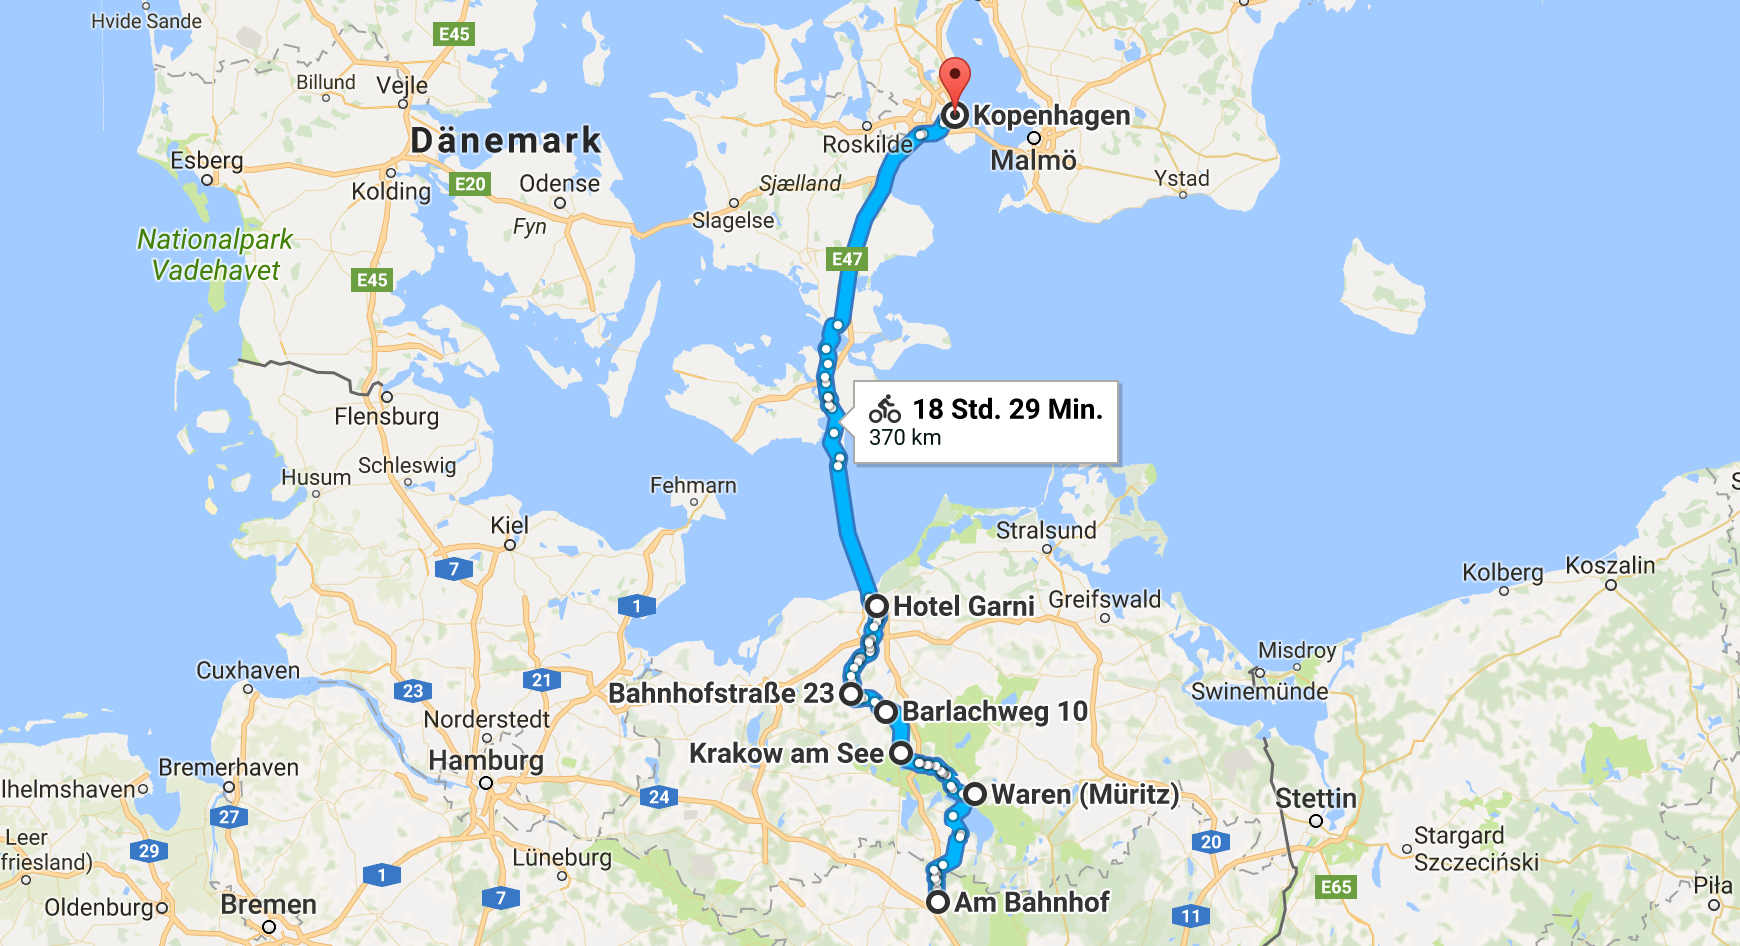 Route Berlin Kopenhagen mit dem Fahrrad